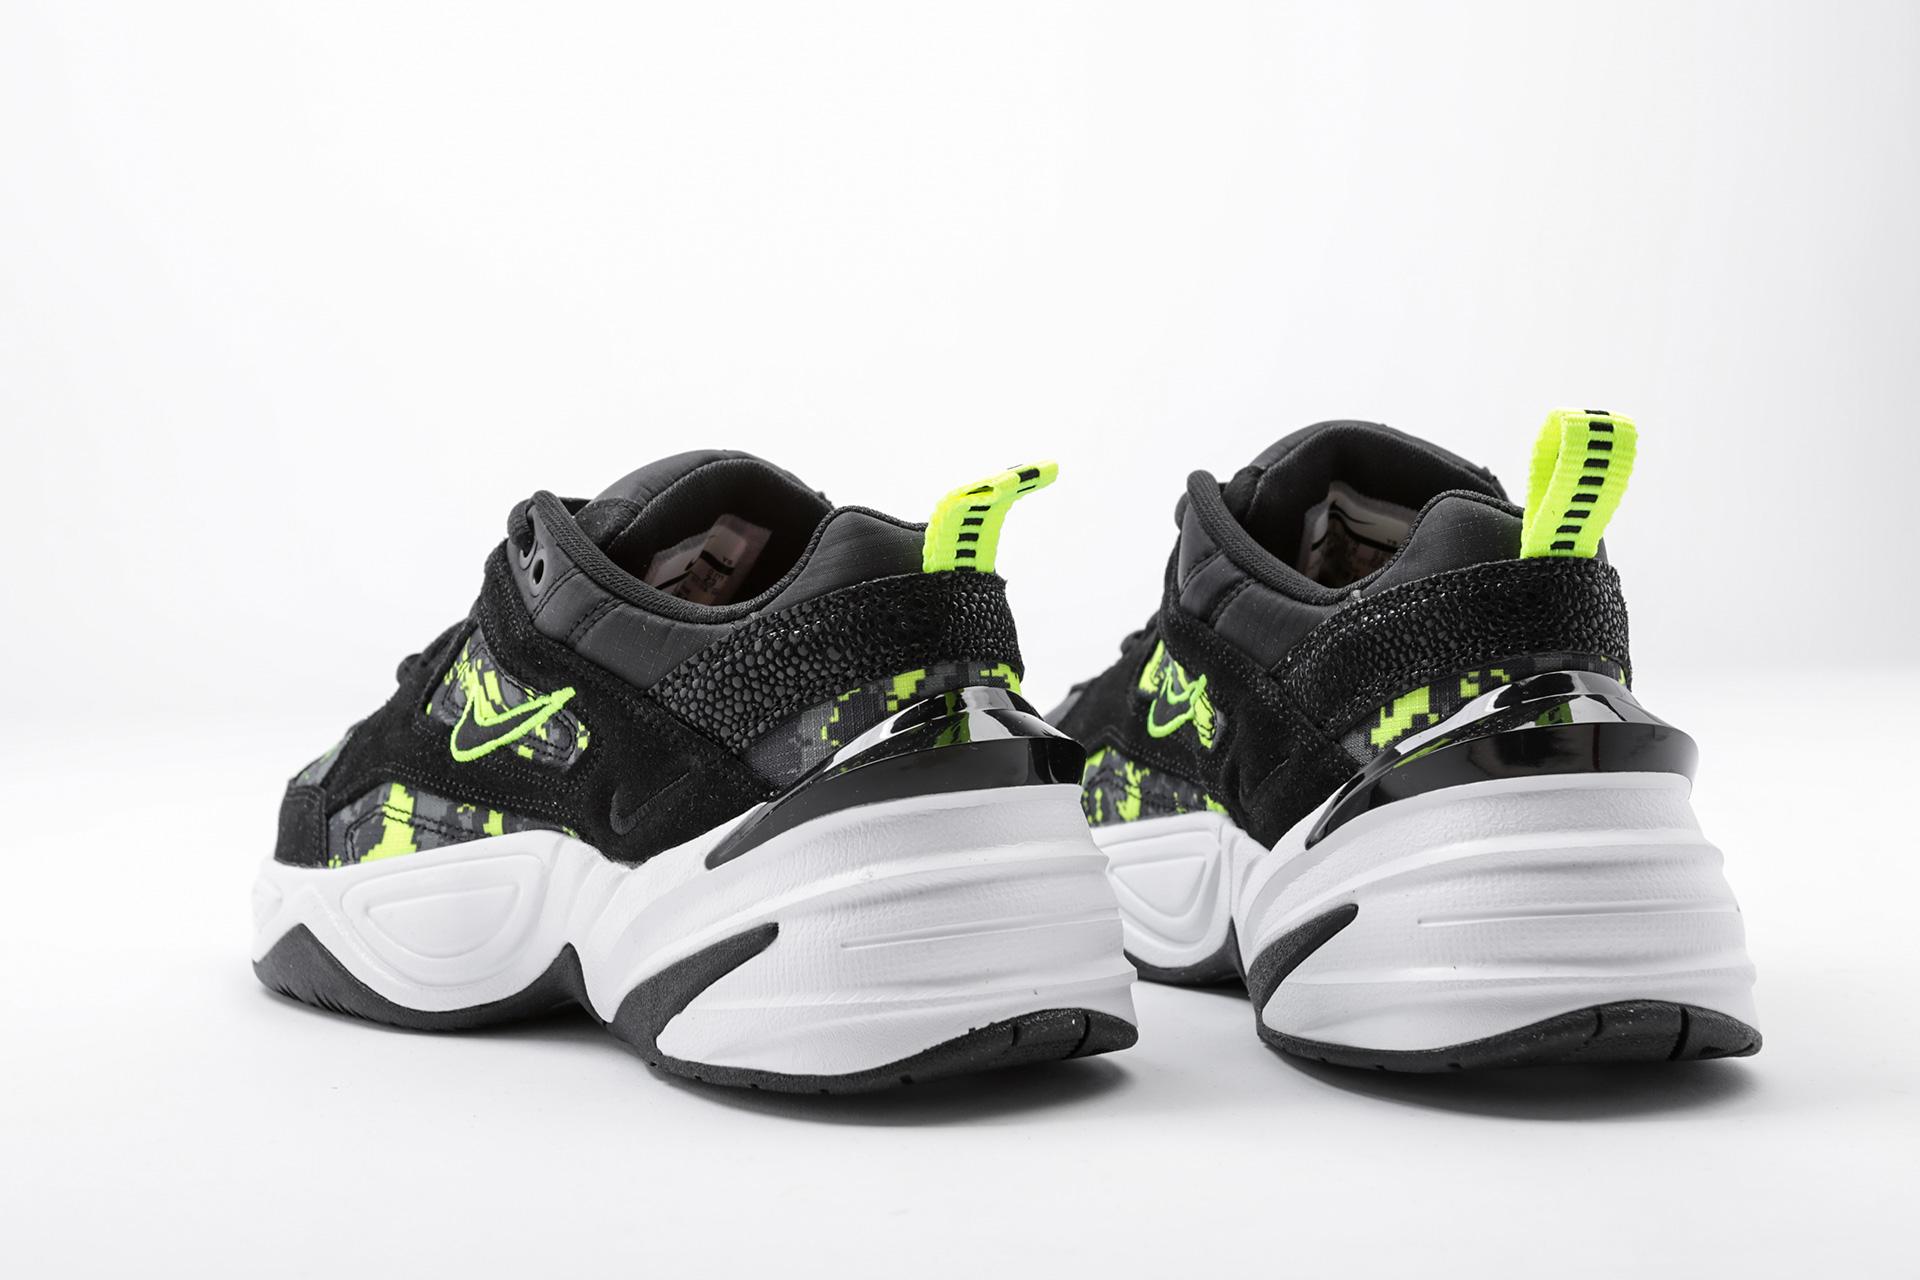 c710e2aa8e0be ... Купить женские черные кроссовки Nike WMNS M2K Tekno - фото 6 картинки